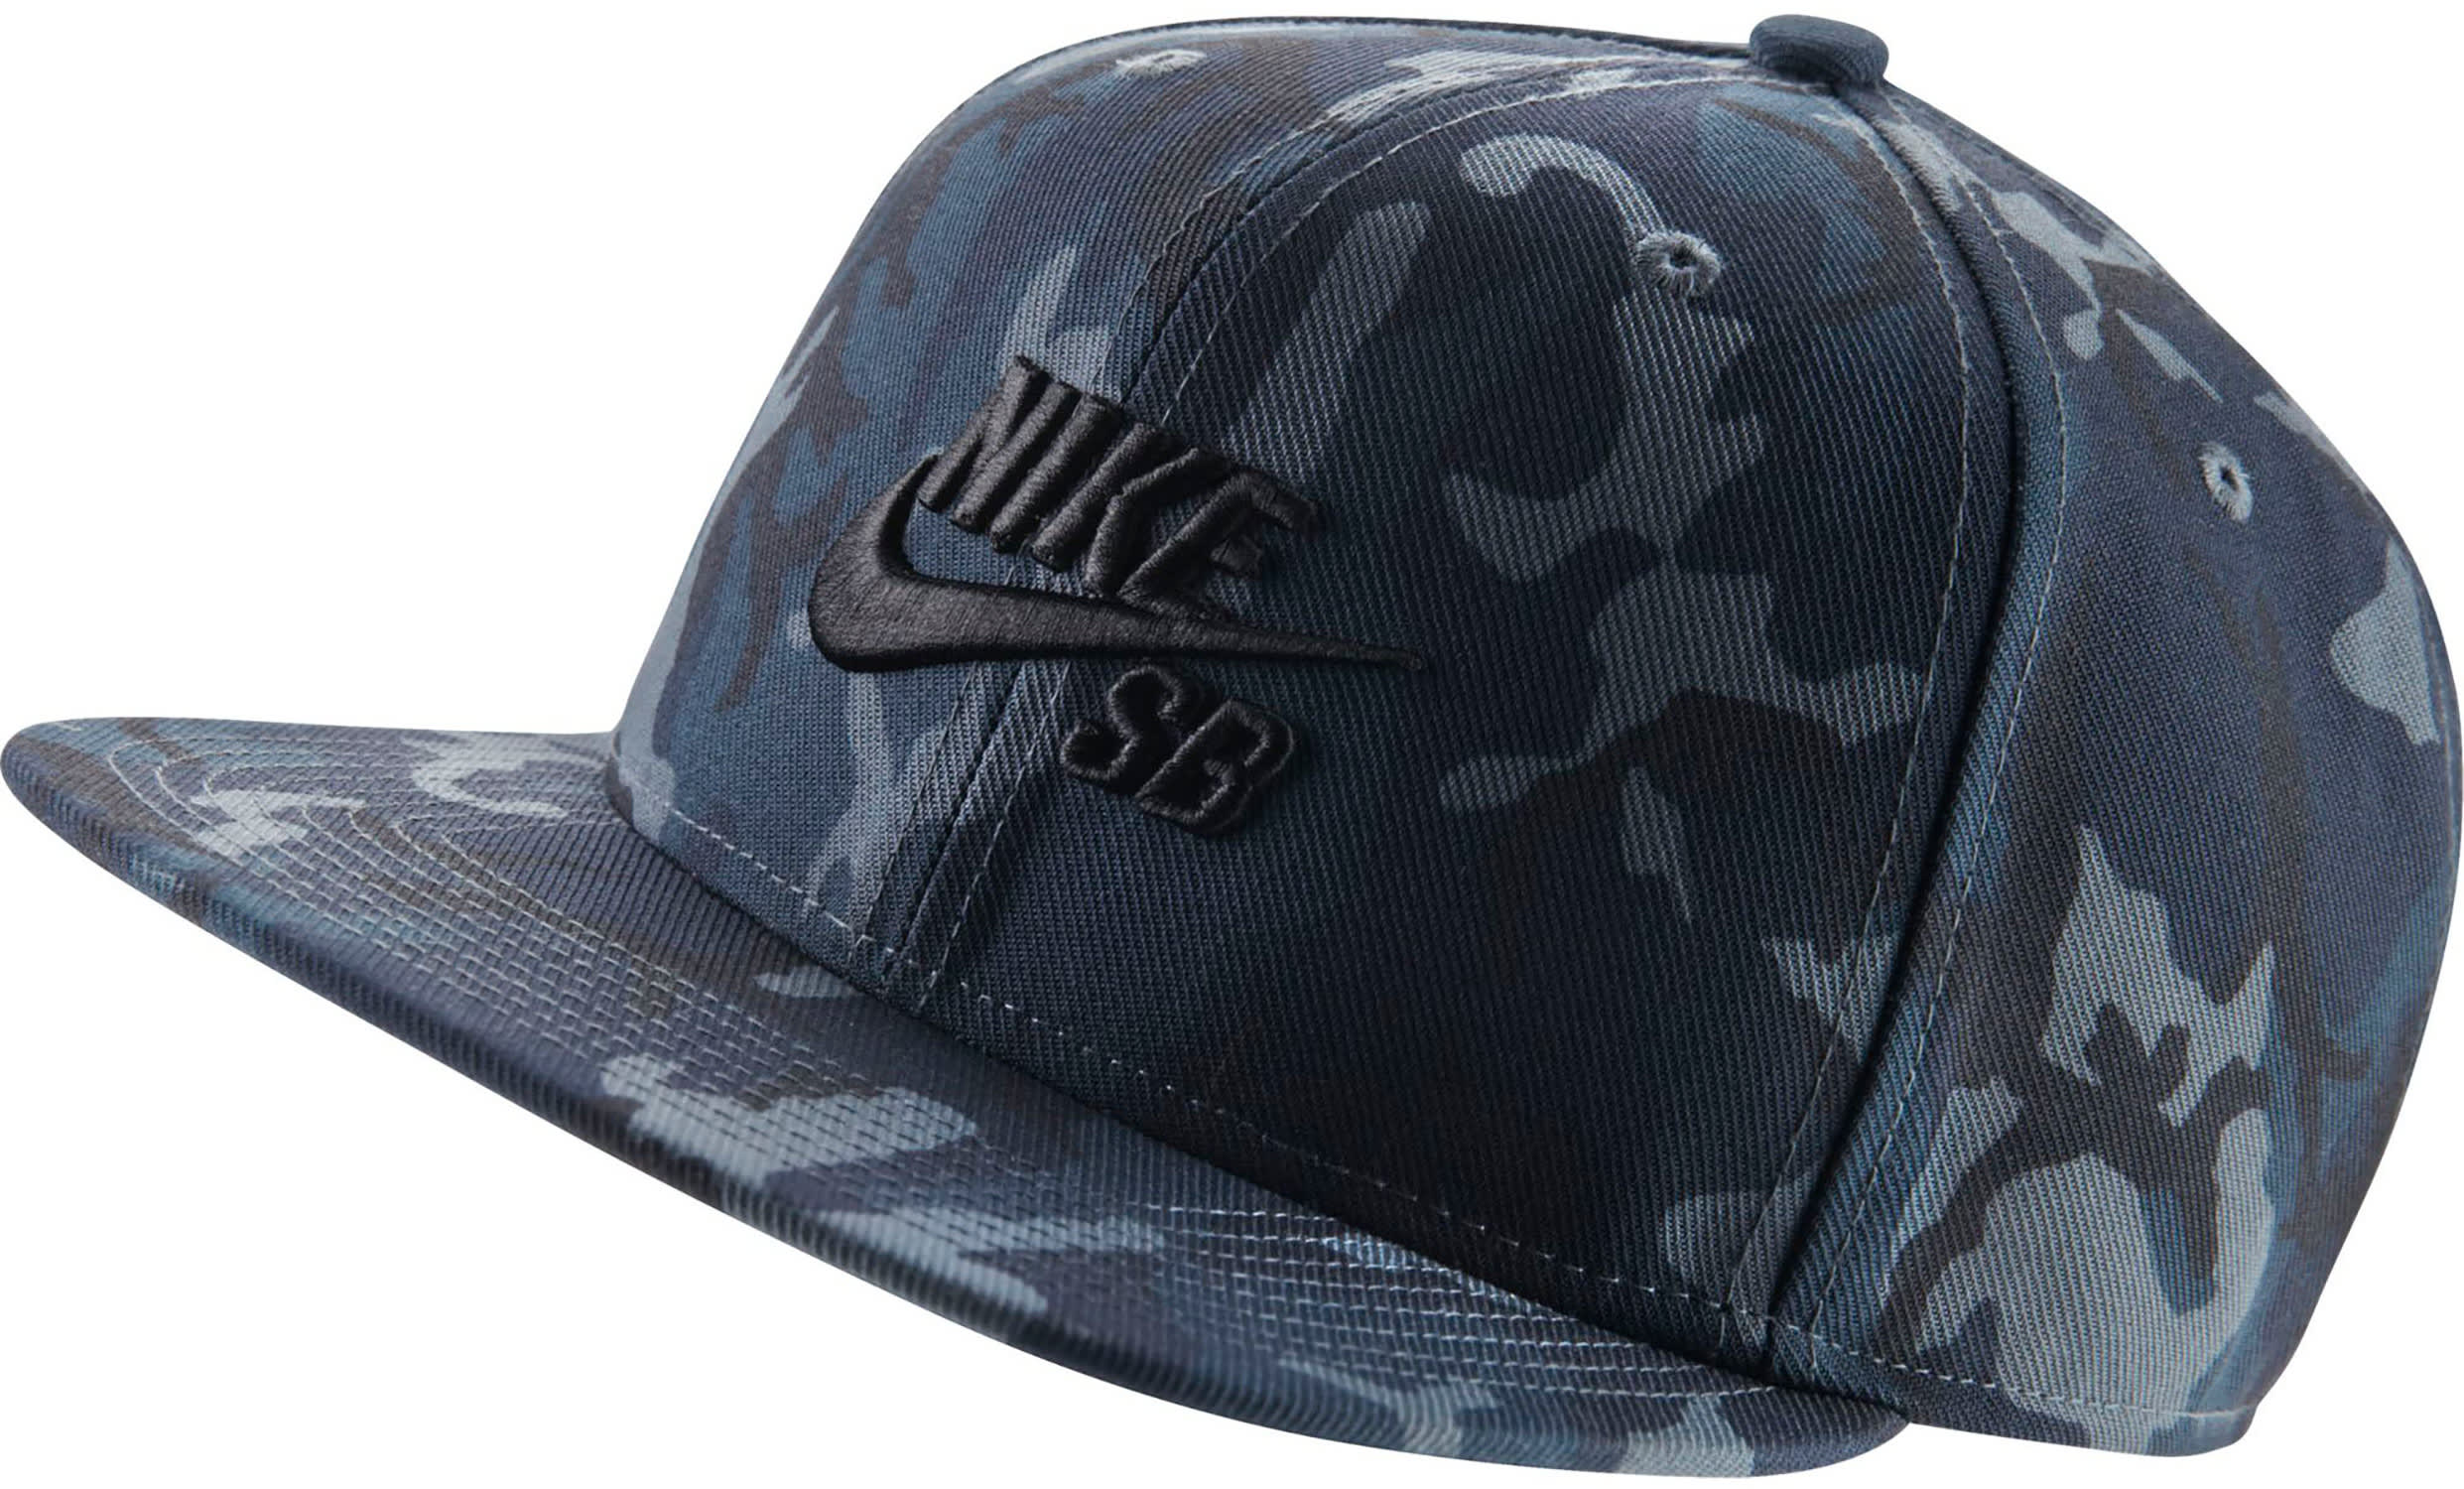 8769bfe72ae Nike SB Perf Camo Trucker Cap - thumbnail 1